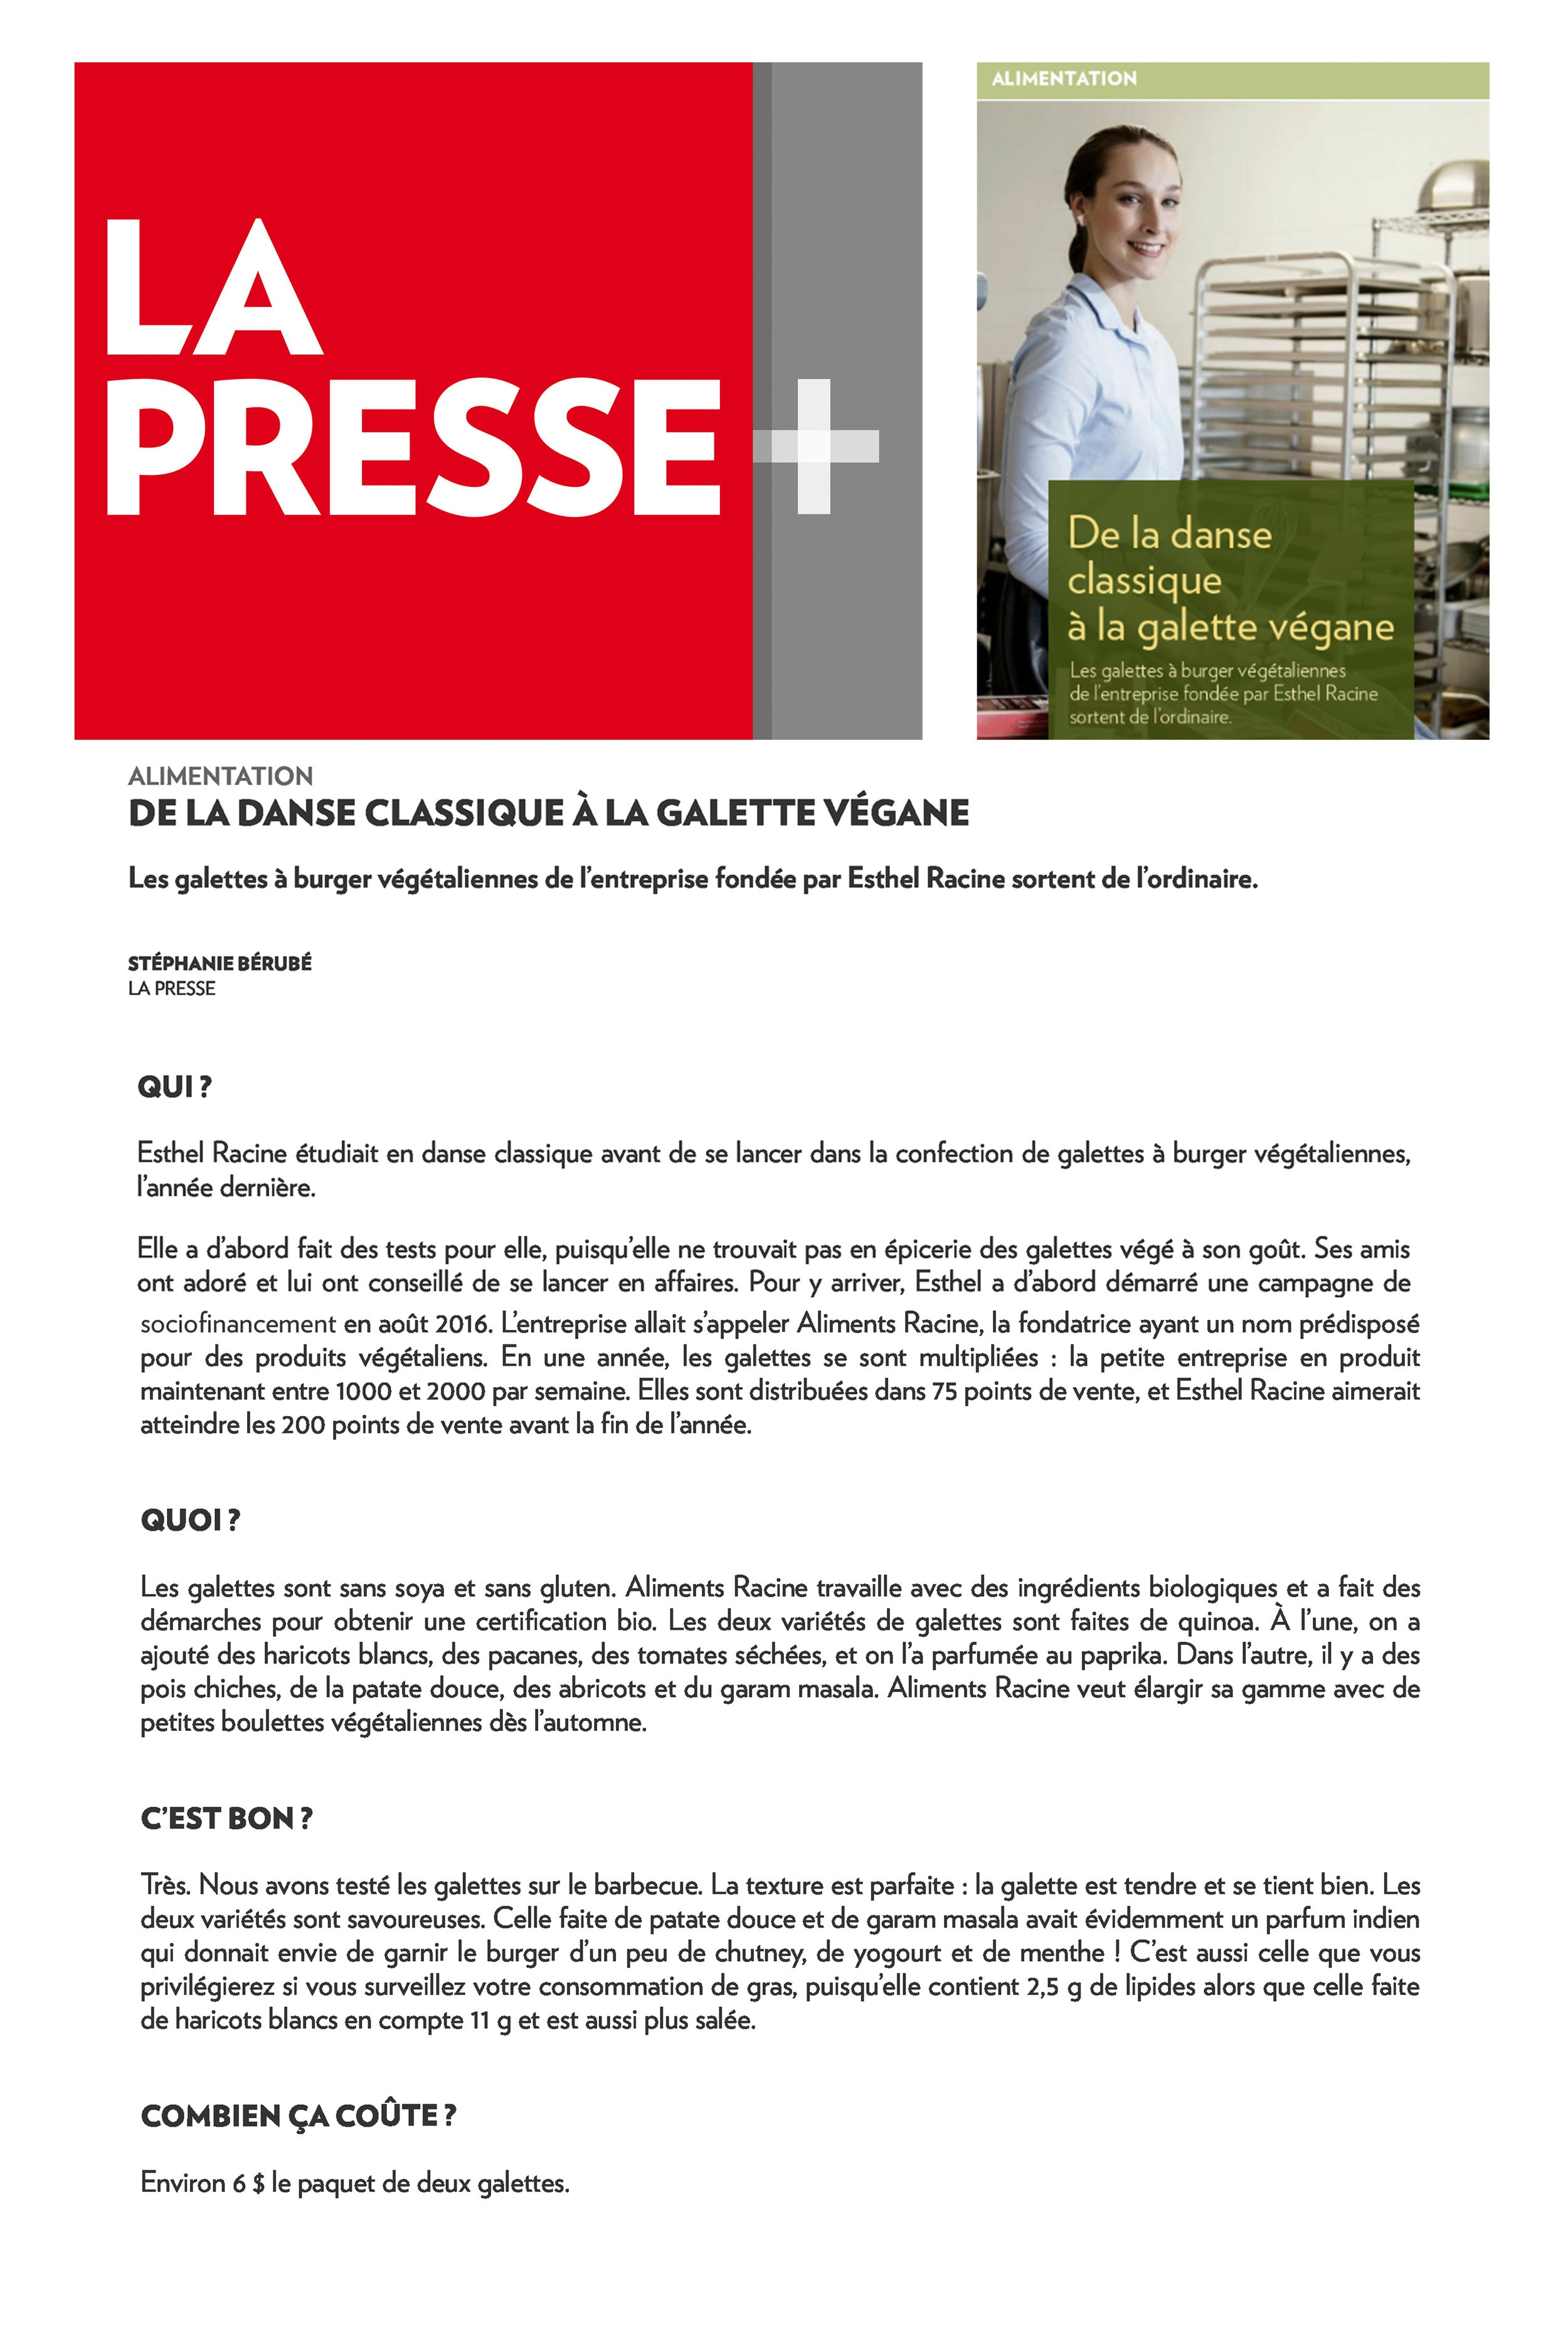 presse++poster.jpg